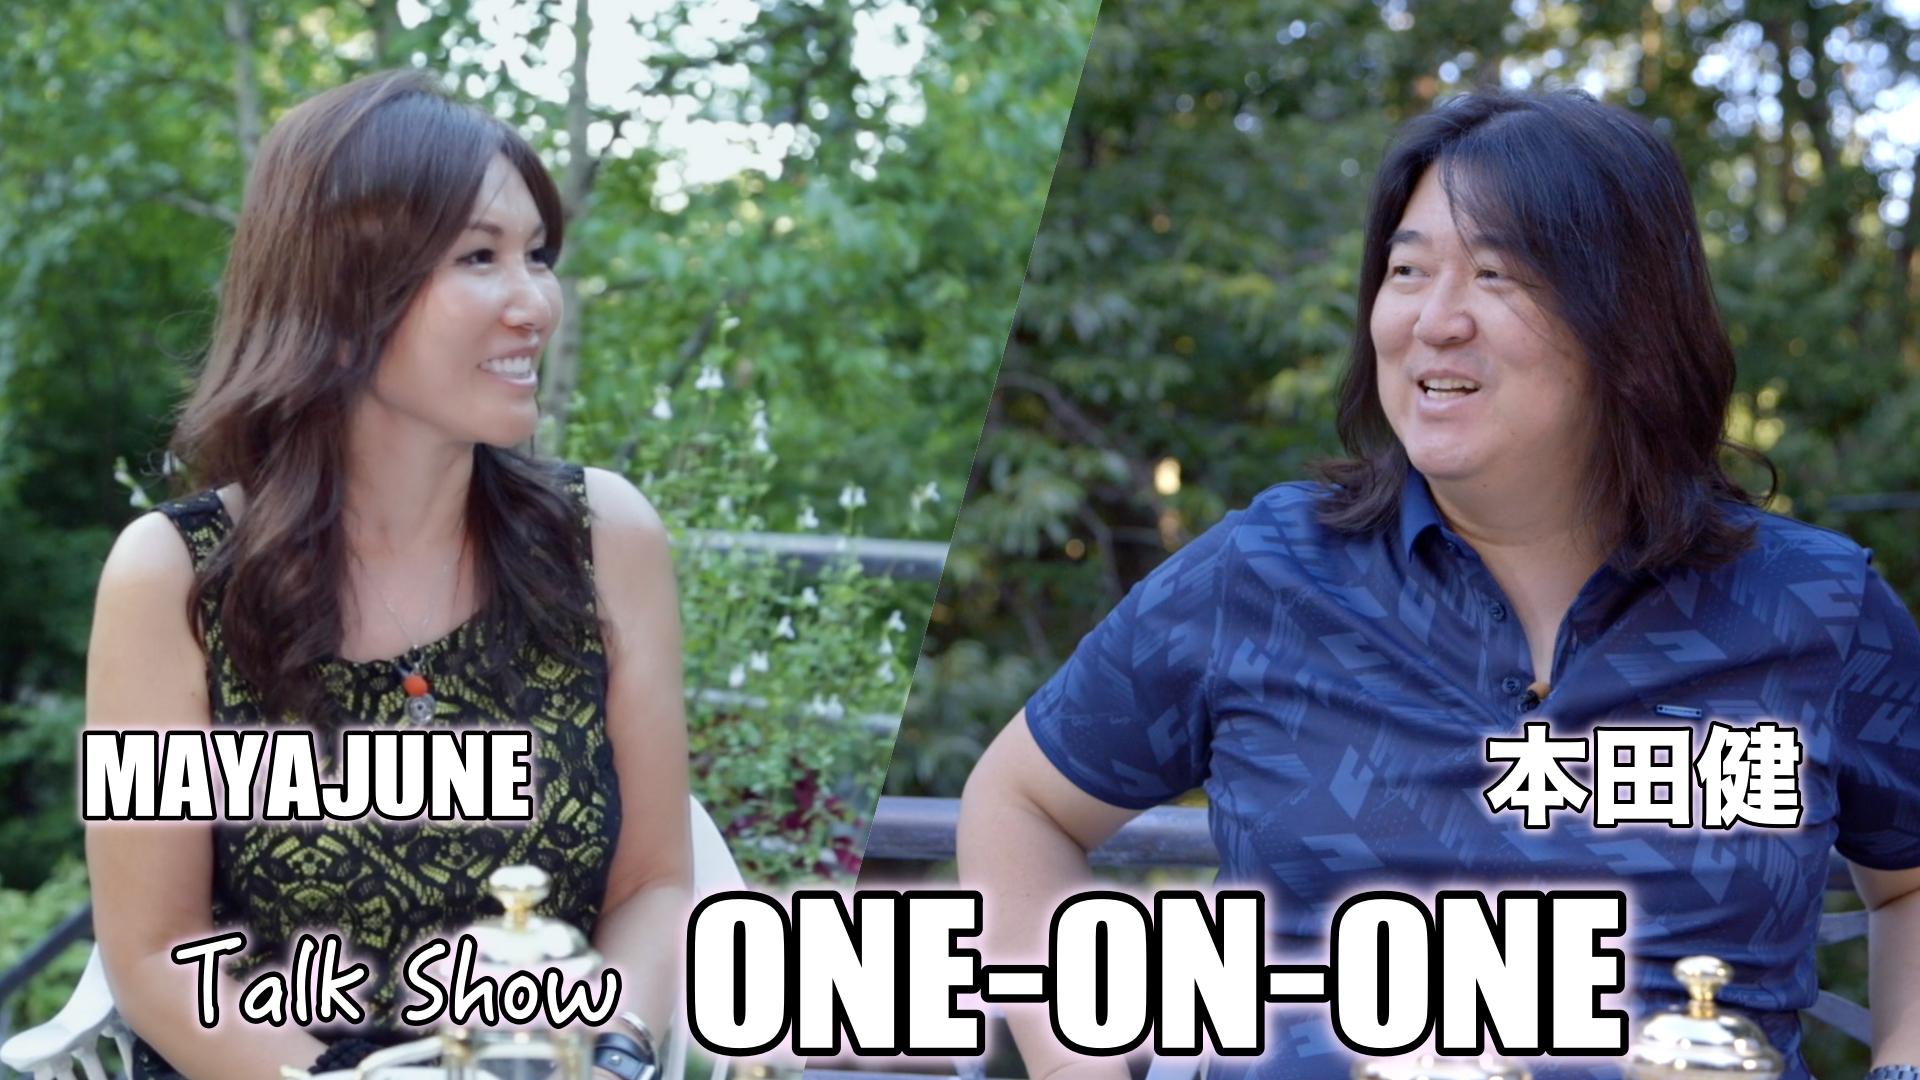 MAYAJUNEトークショー ONE-ON-ONE